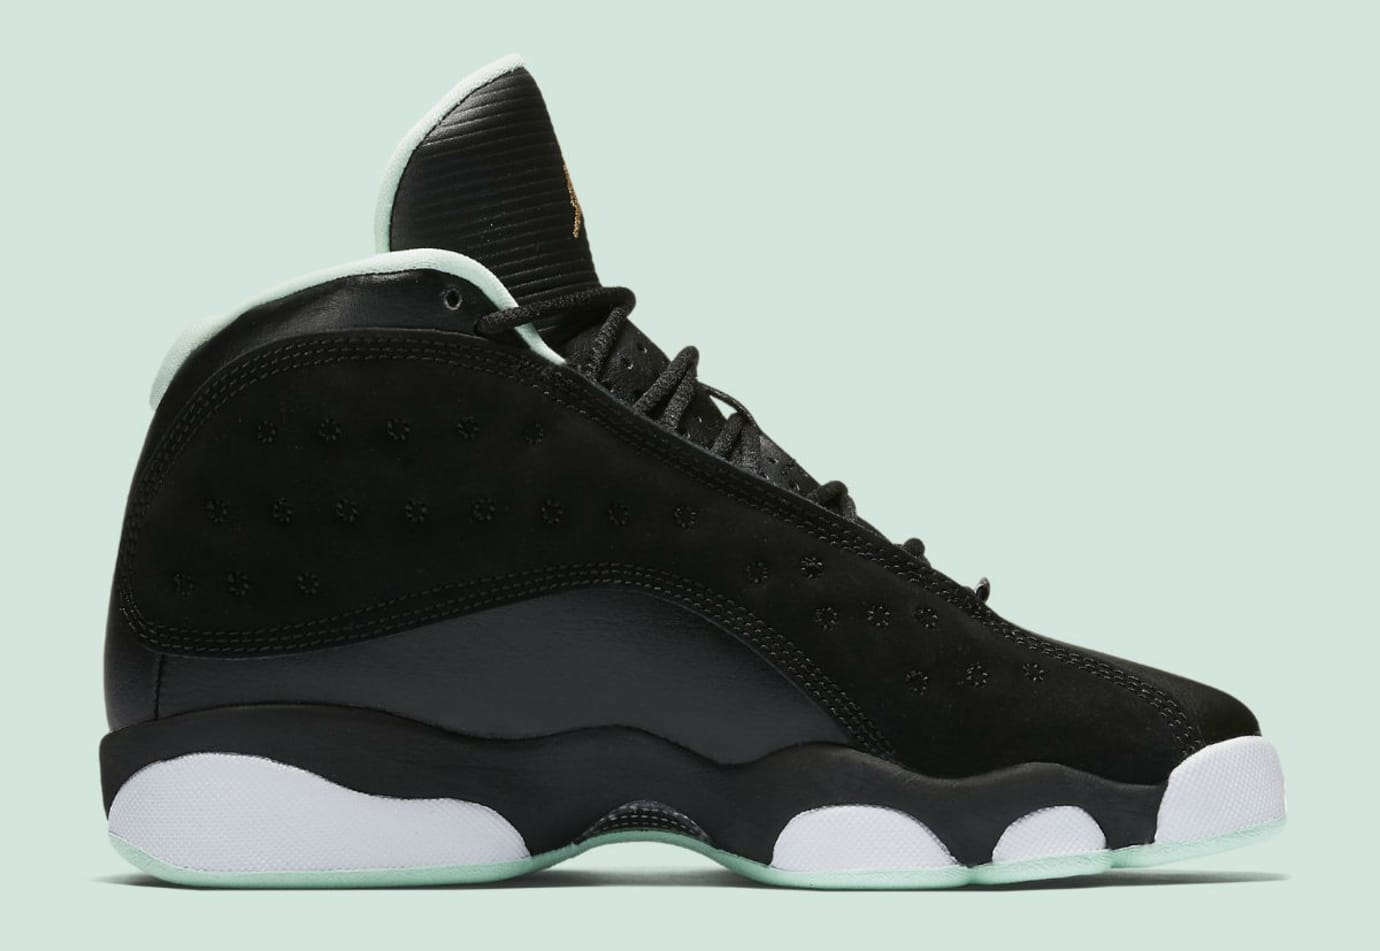 hot sale online a1c24 a6f91 Air Jordan 13 Mint Foam Release Date Medial 439358-015